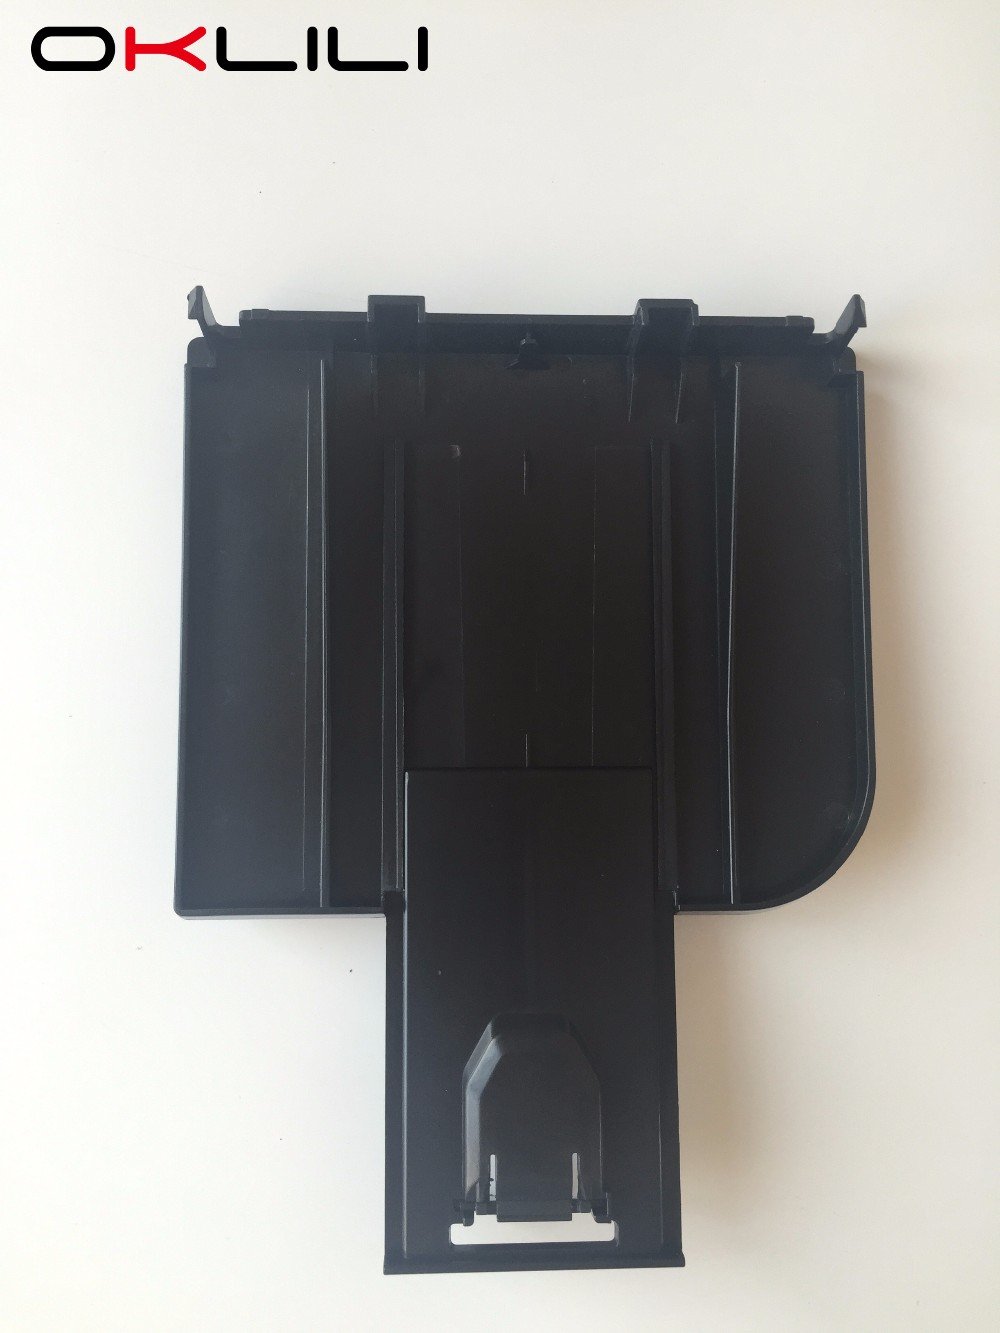 RC2-9441-000 RM1-7498-000 RM1-7498 RM1-7498-000CN Бумага лоток Выход лоток для hp LaserJet M1536 P1606 CP1525 P1566